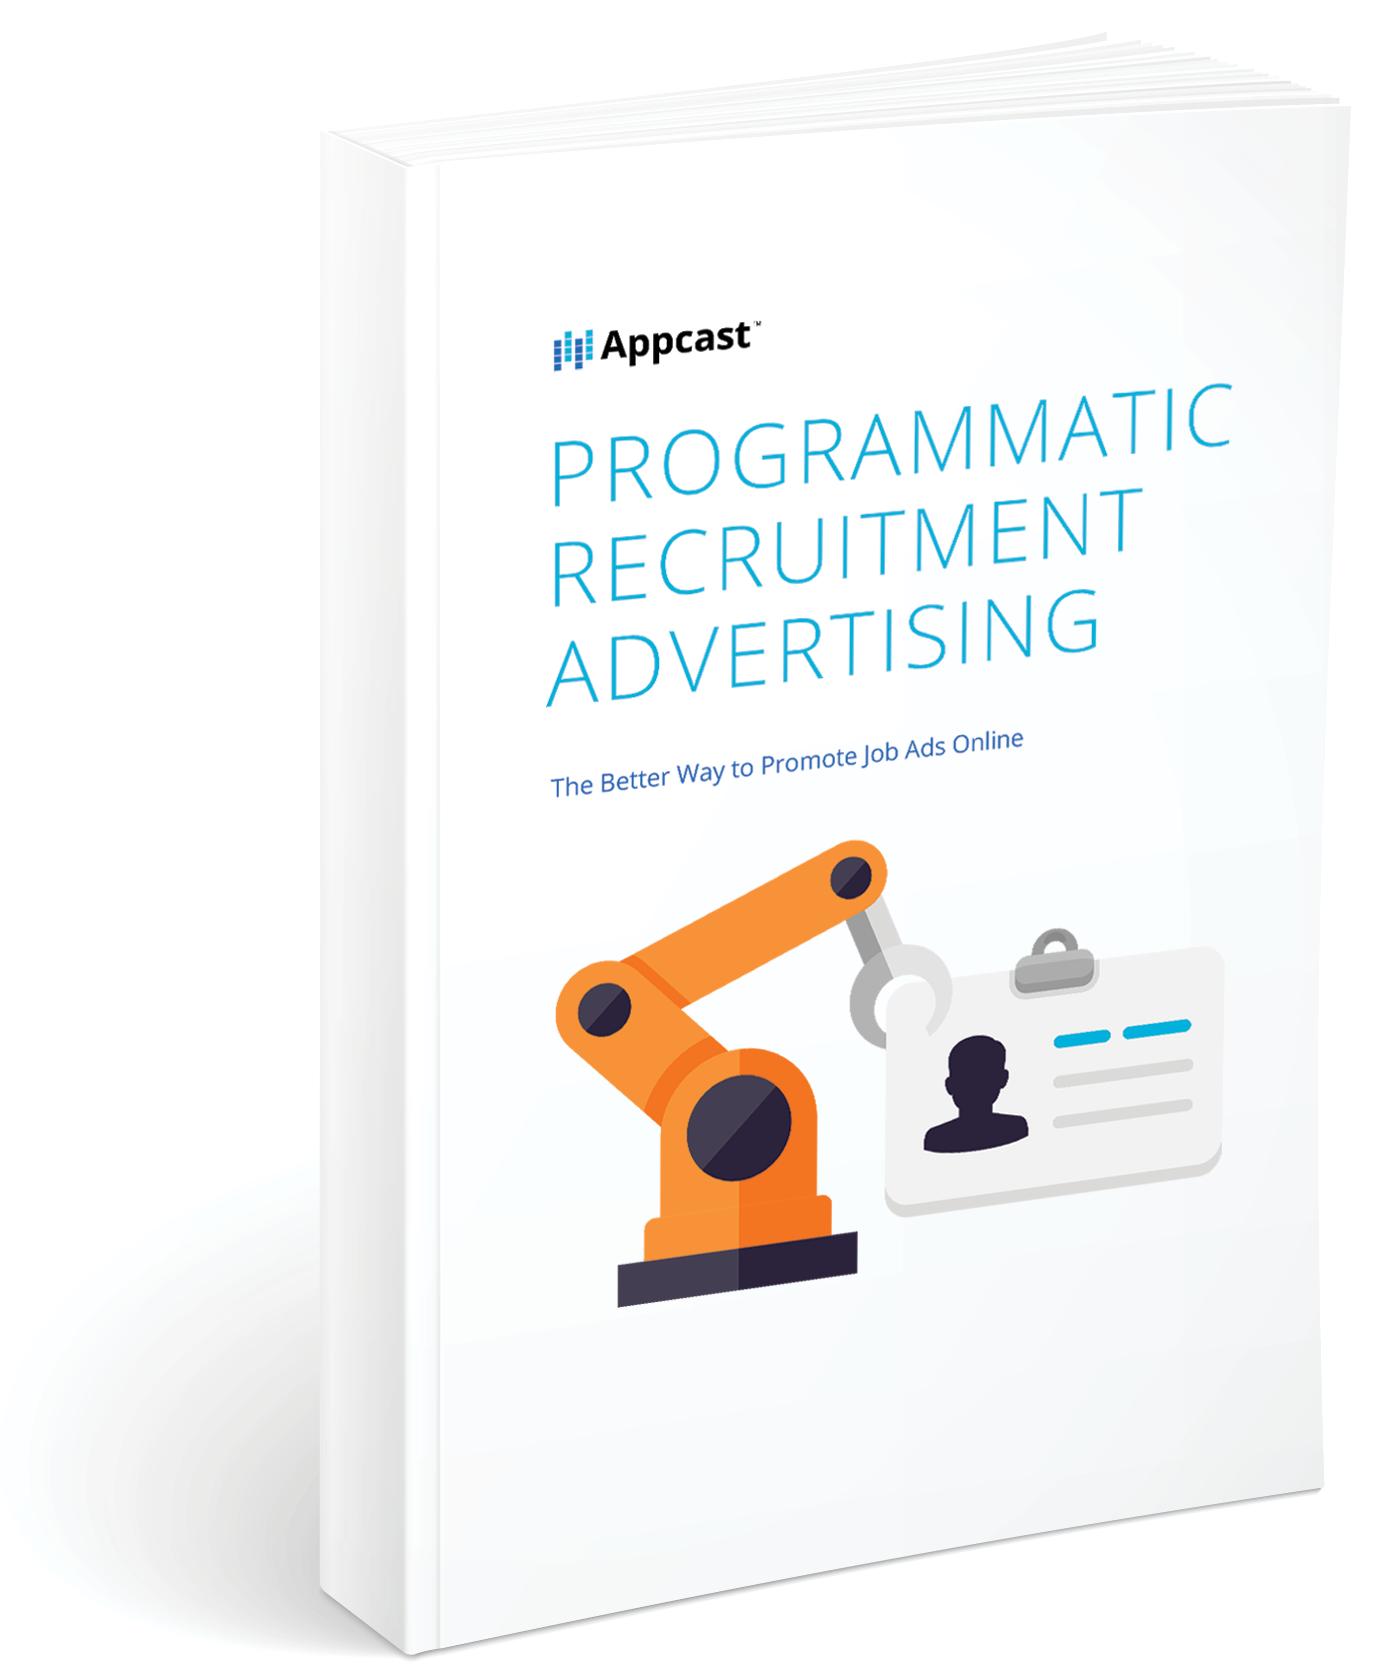 appcast_whitepaper_programmatic_3D_1.png